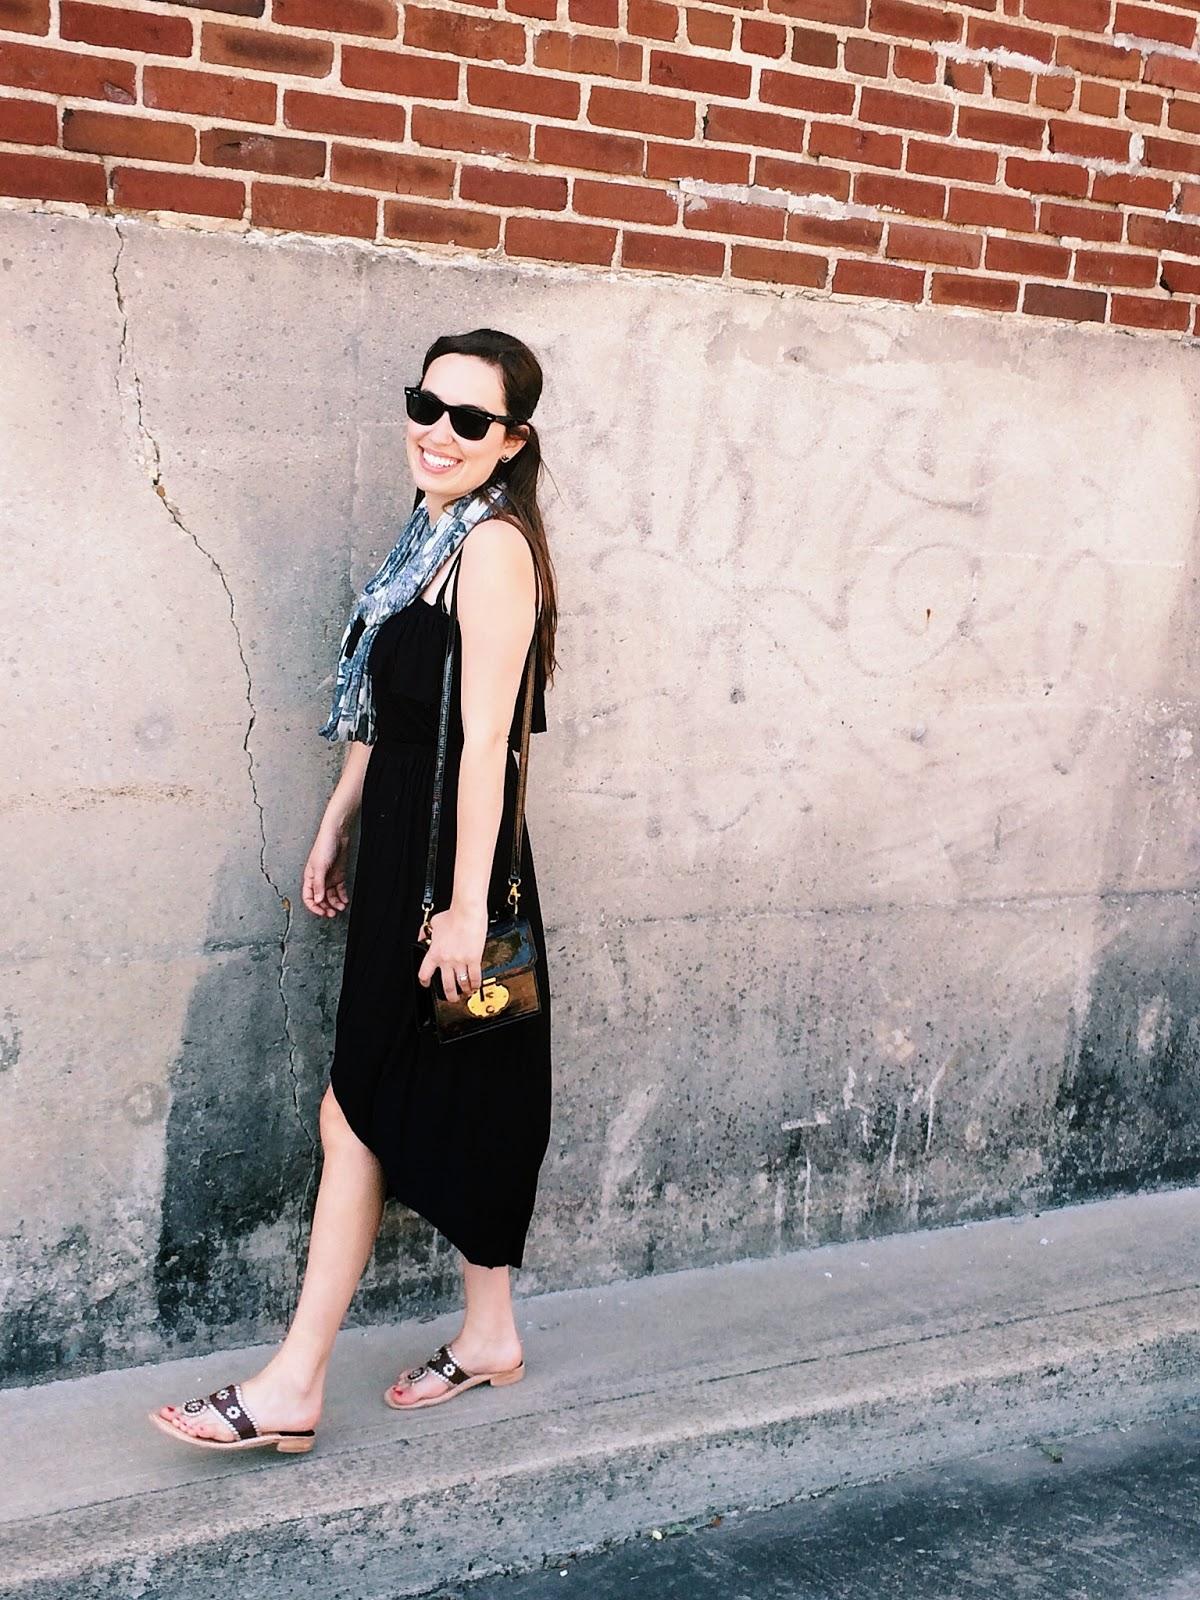 trendy in texas, blog, jack rogers, black maxi dress, strapless black maxi dress, tasseled necklace scarf, tasseled necklace scarf anthropologie, eyelet vines infinity scarf, anthropologie, alice kerley